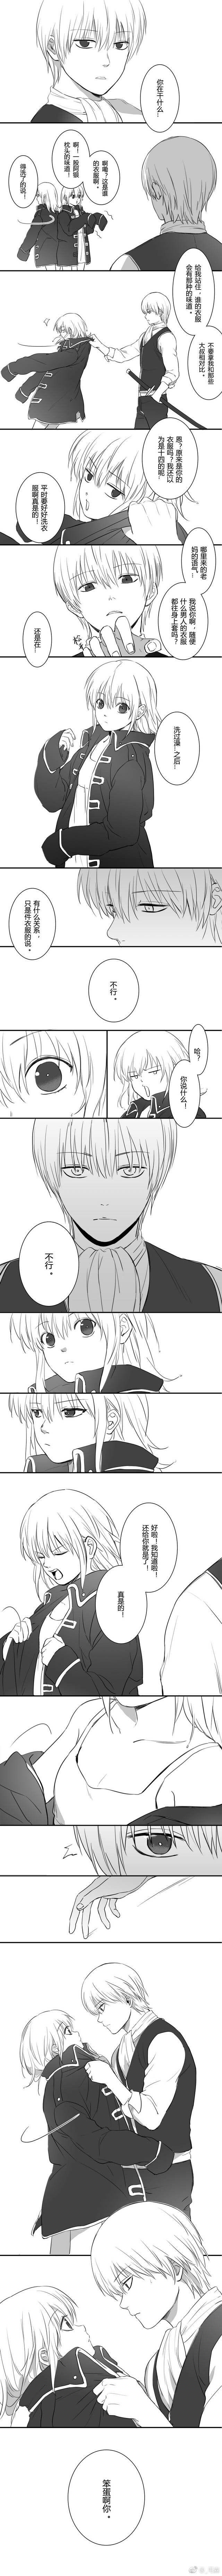 Sougo Okita x Kagura [OkiKagu] ~ Сого Окита x Кагура ~ [ОкиКагу]